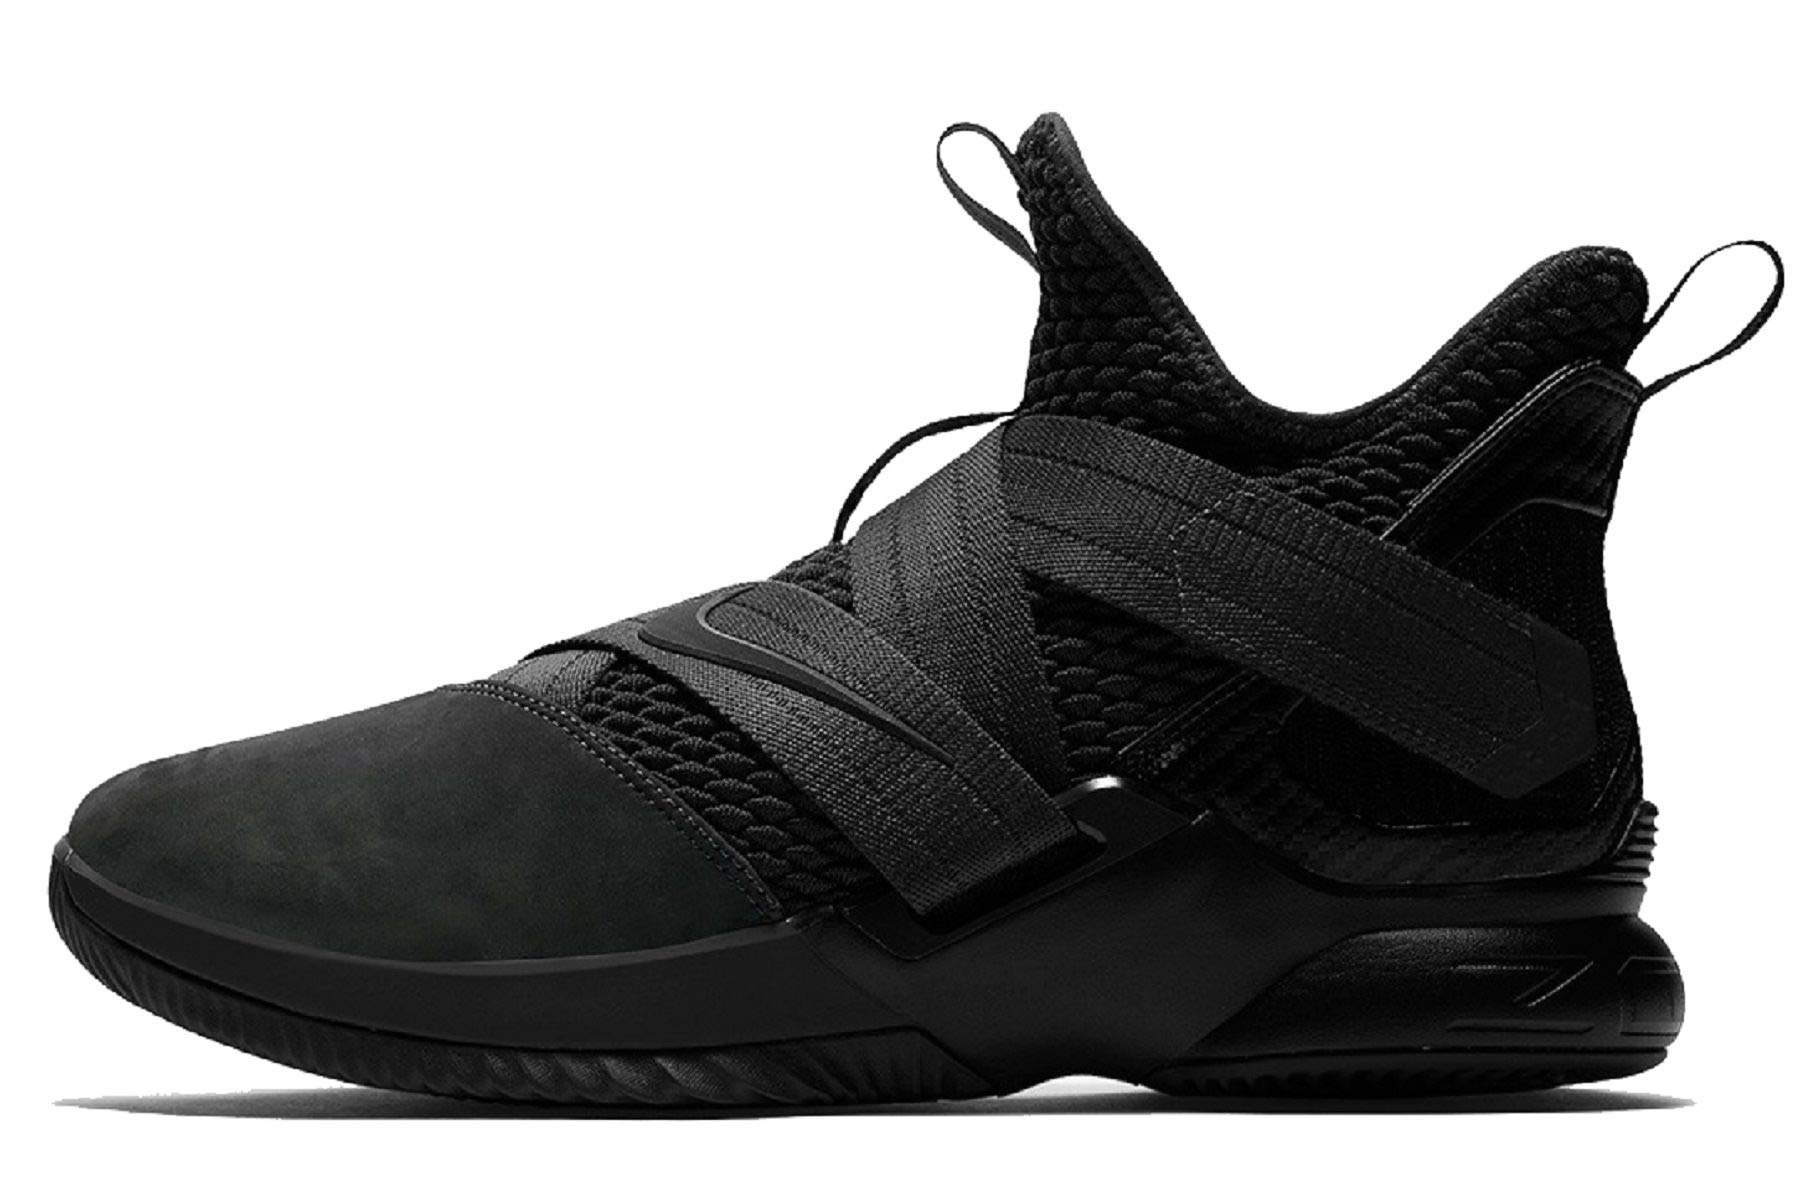 8c16c64e50ca Galleon - NIKE Lebron Soldier XII SFG Mens Basketball-Shoes AO4054-003 9 -  Black Black-Black